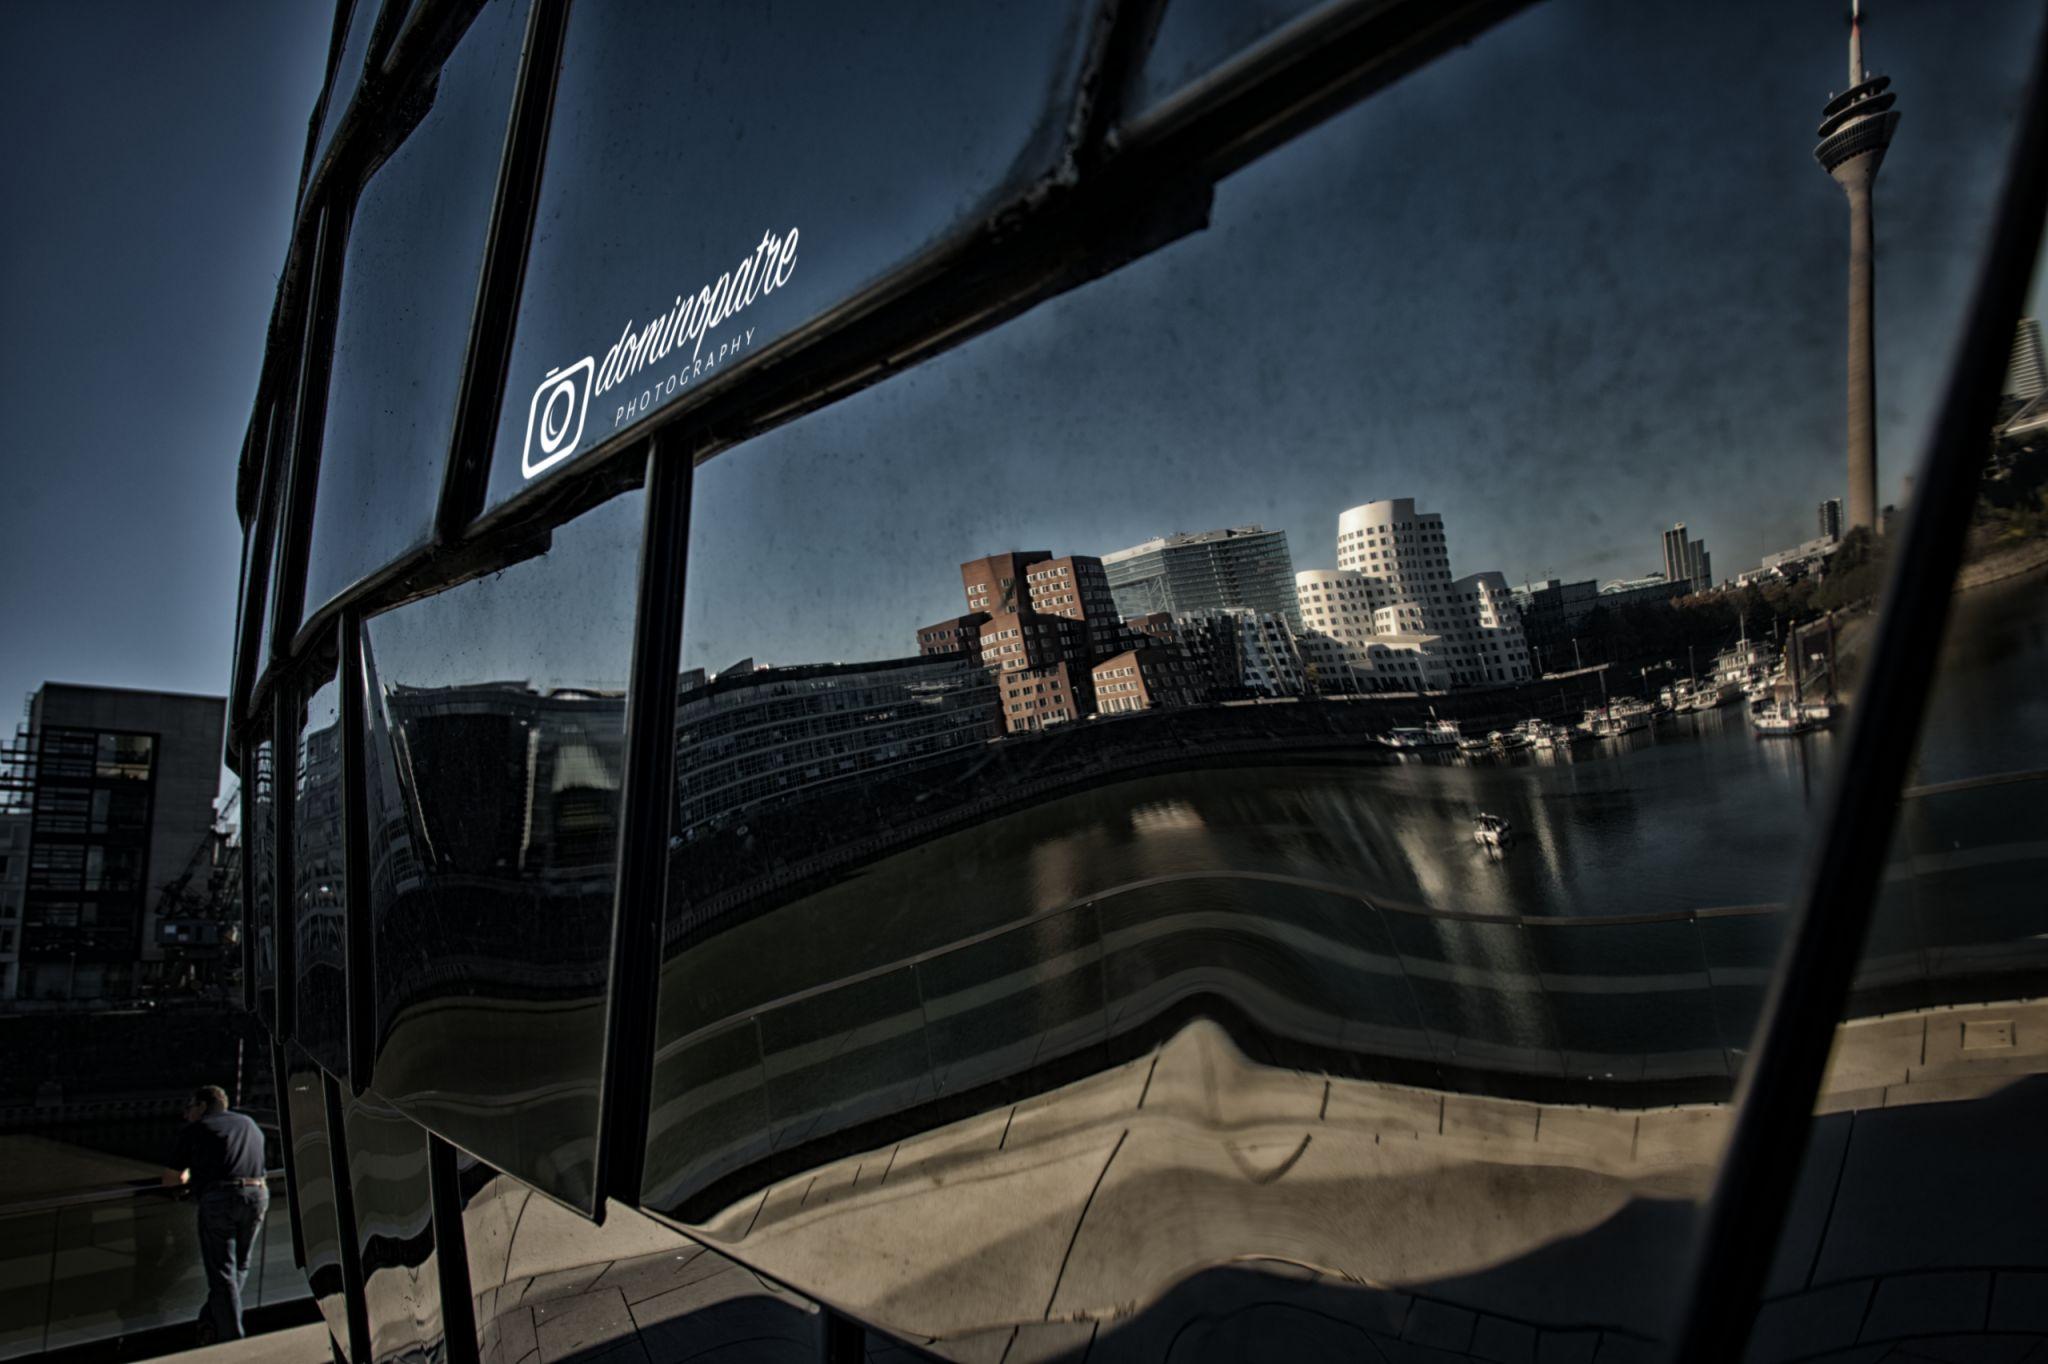 Pebble's Terrasse im Medienhafen Düsseldorf, Germany